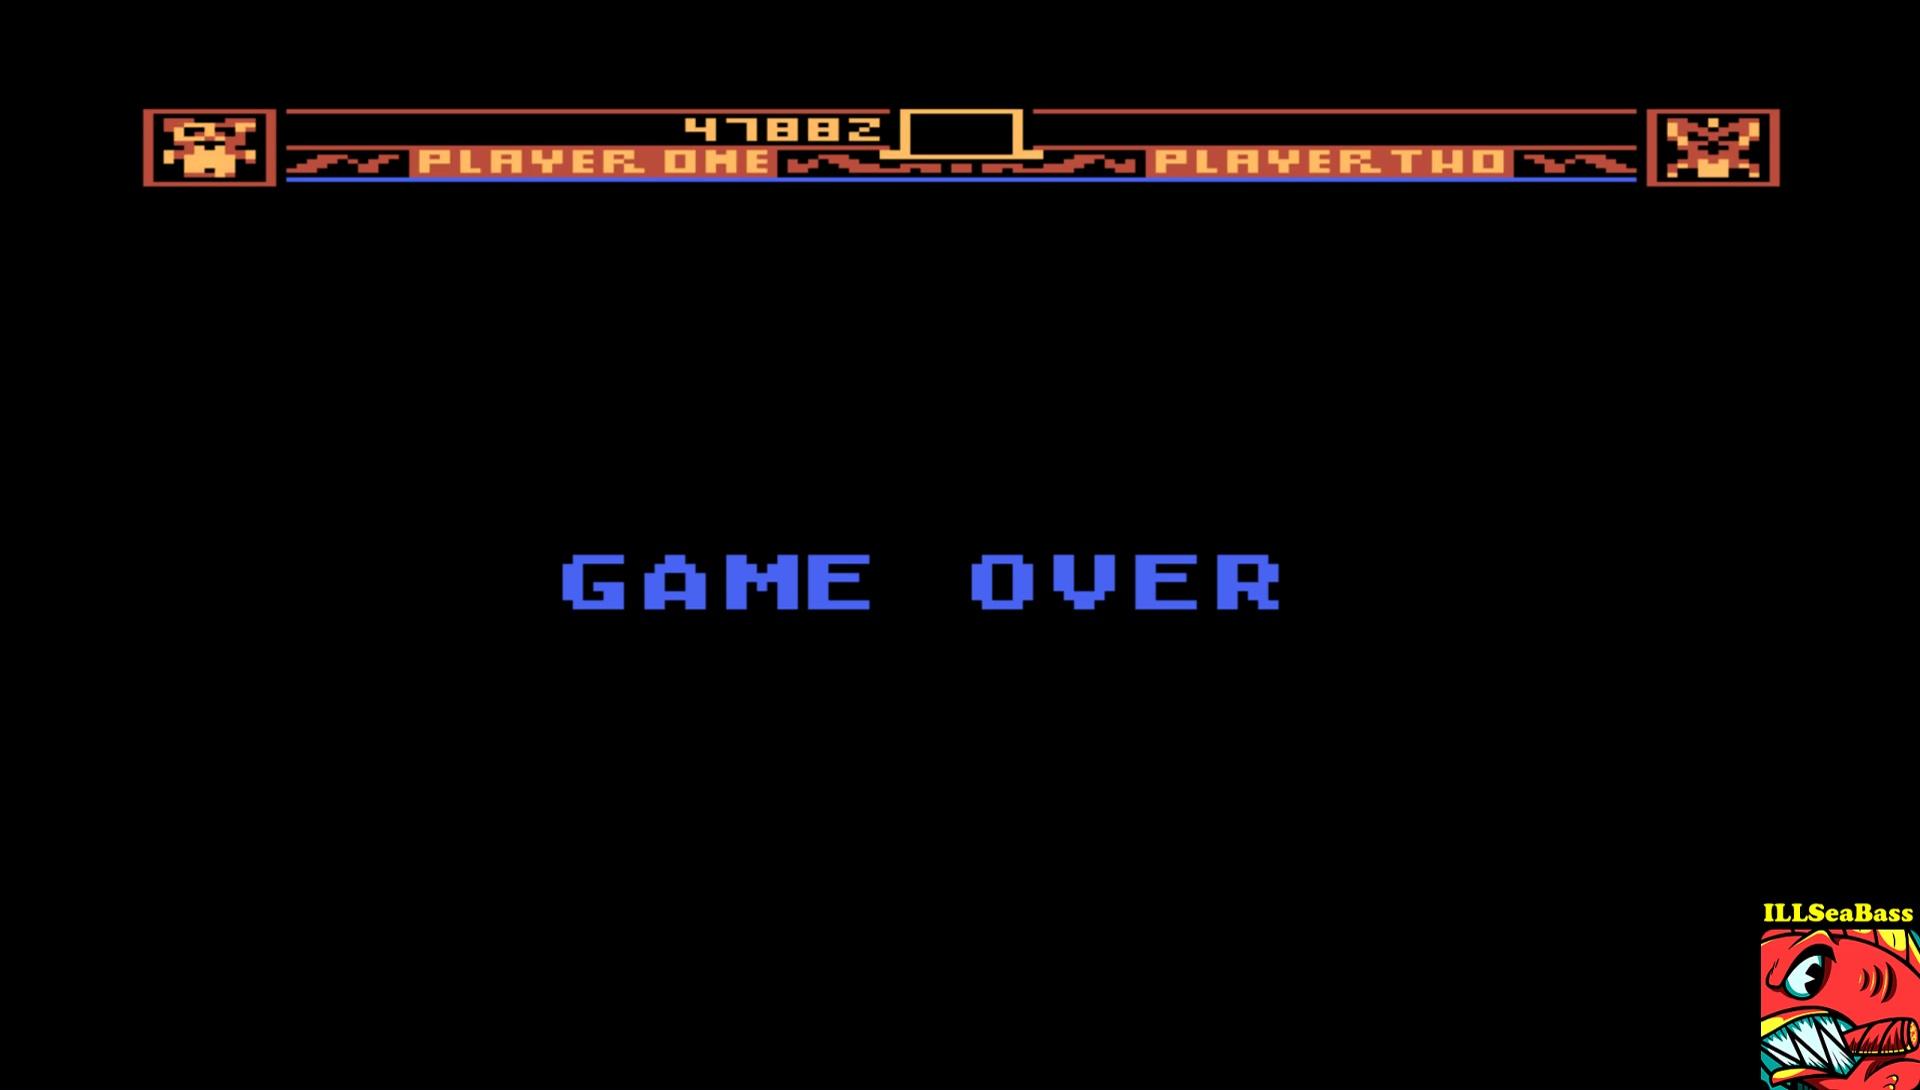 ILLSeaBass: Gremlins (Atari 400/800/XL/XE Emulated) 47,882 points on 2017-03-11 03:06:01